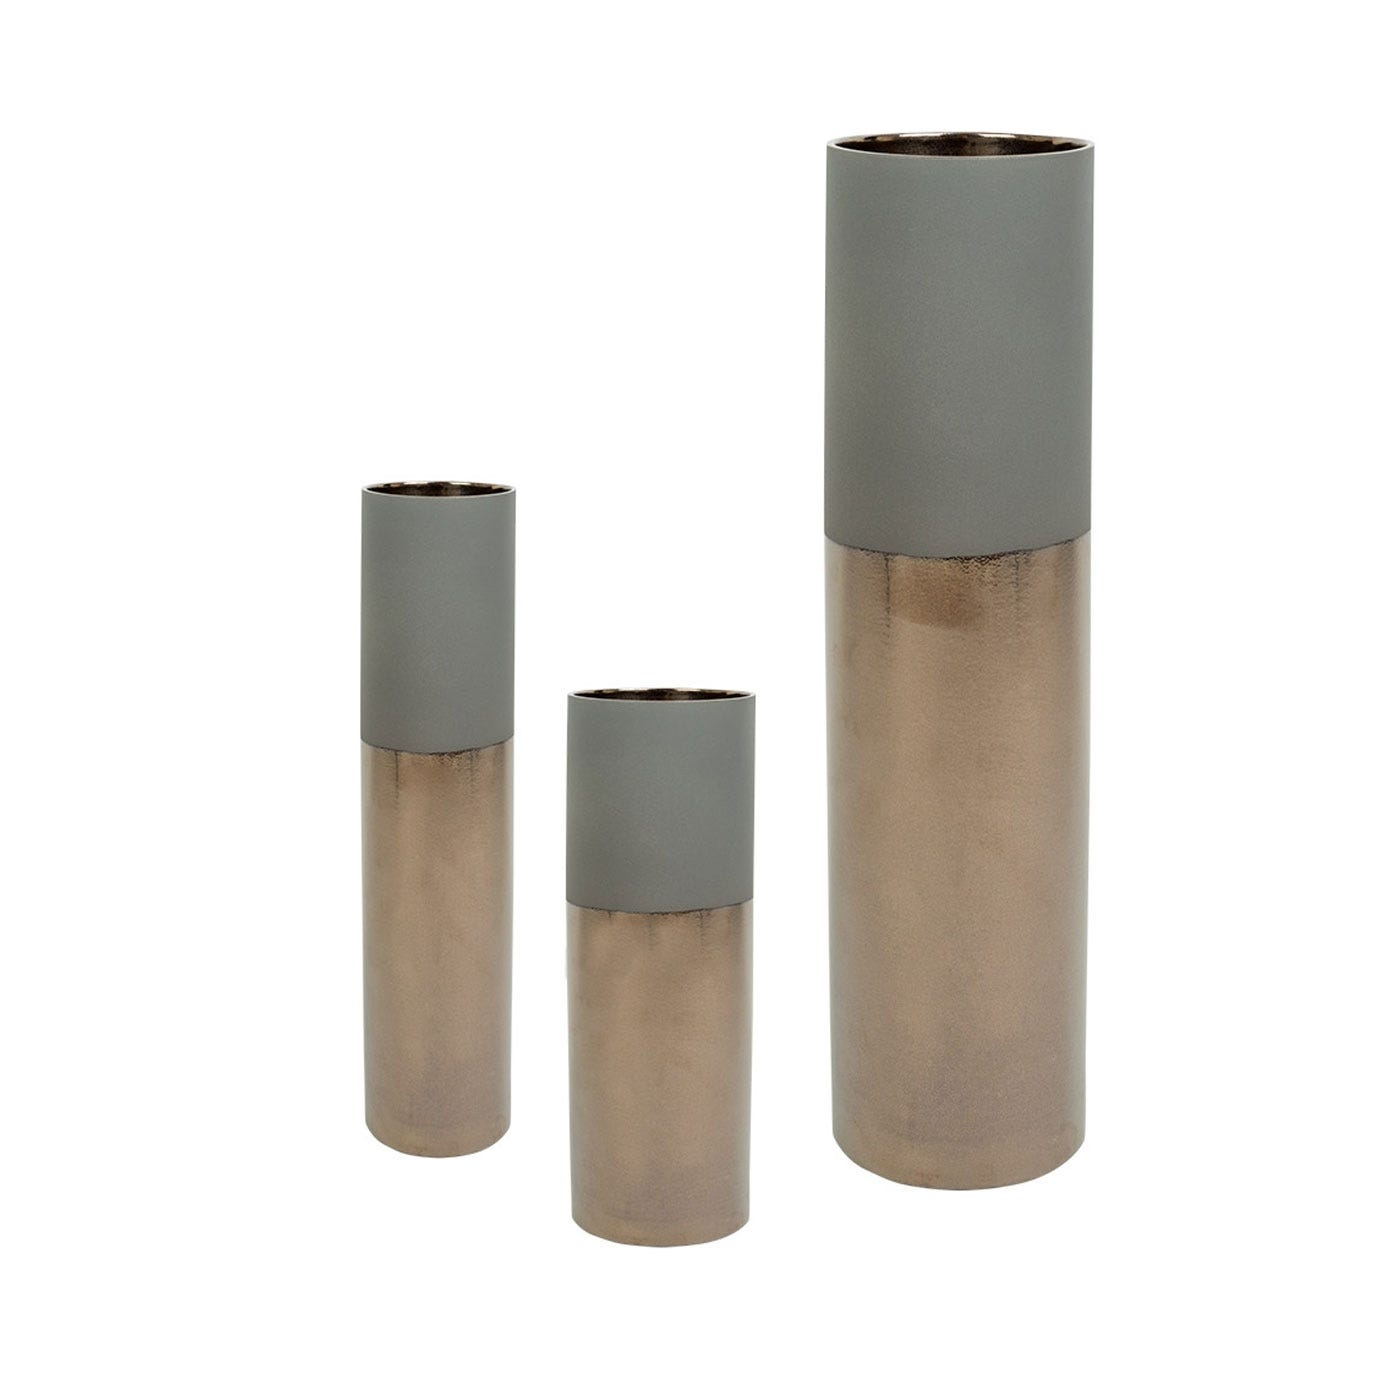 Dual Tone Vase Grey & Metallic